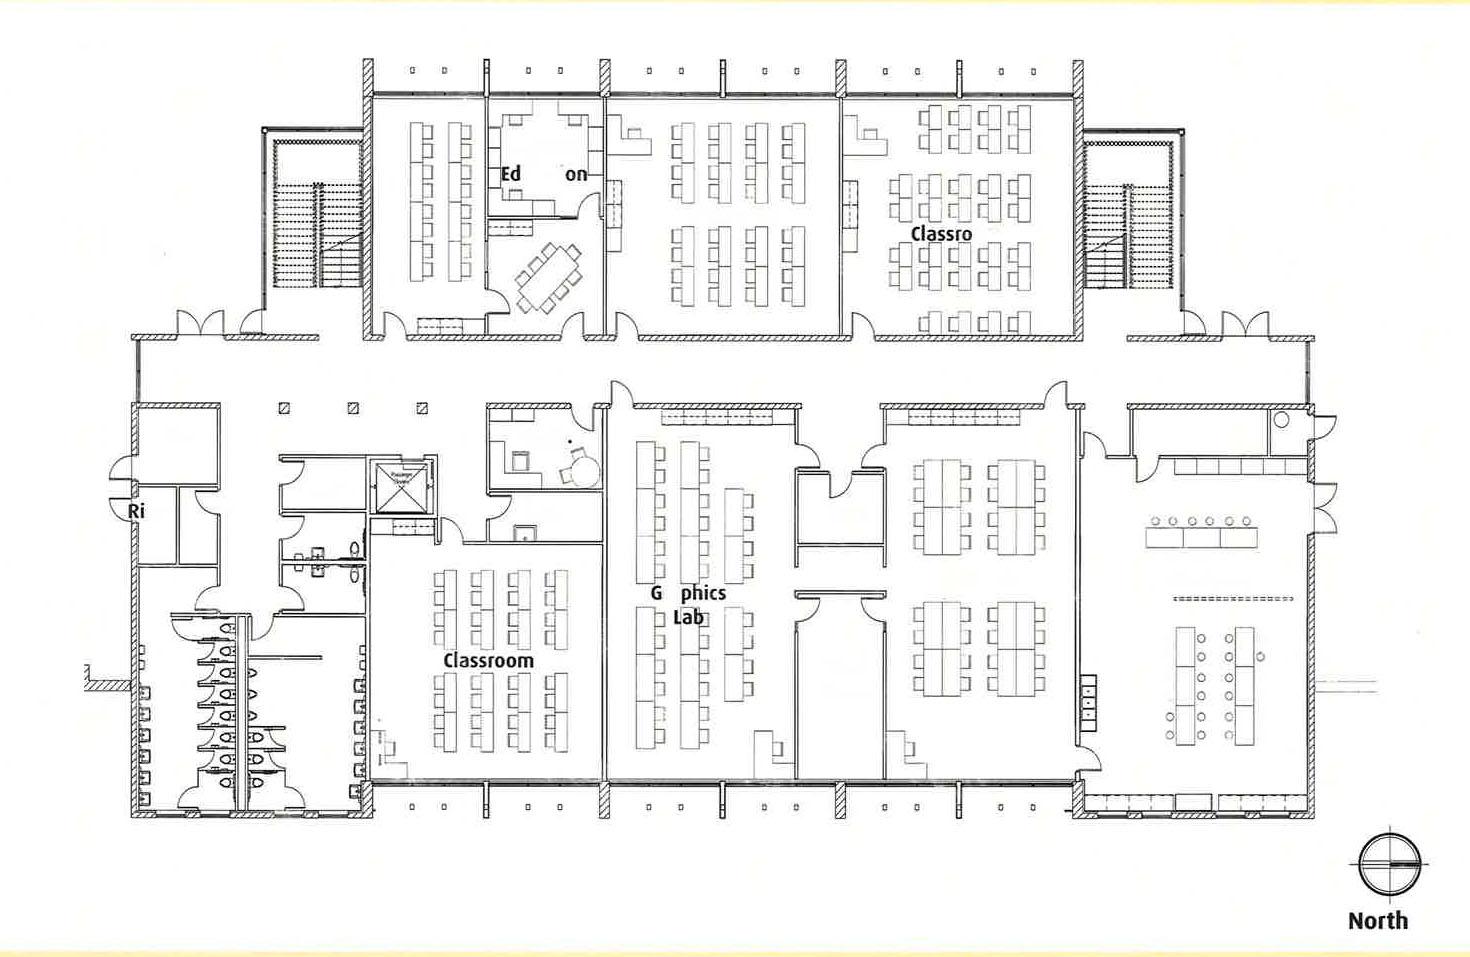 Classrooms Plan : Toddler Classroom Floor Plan Floor plan for the new